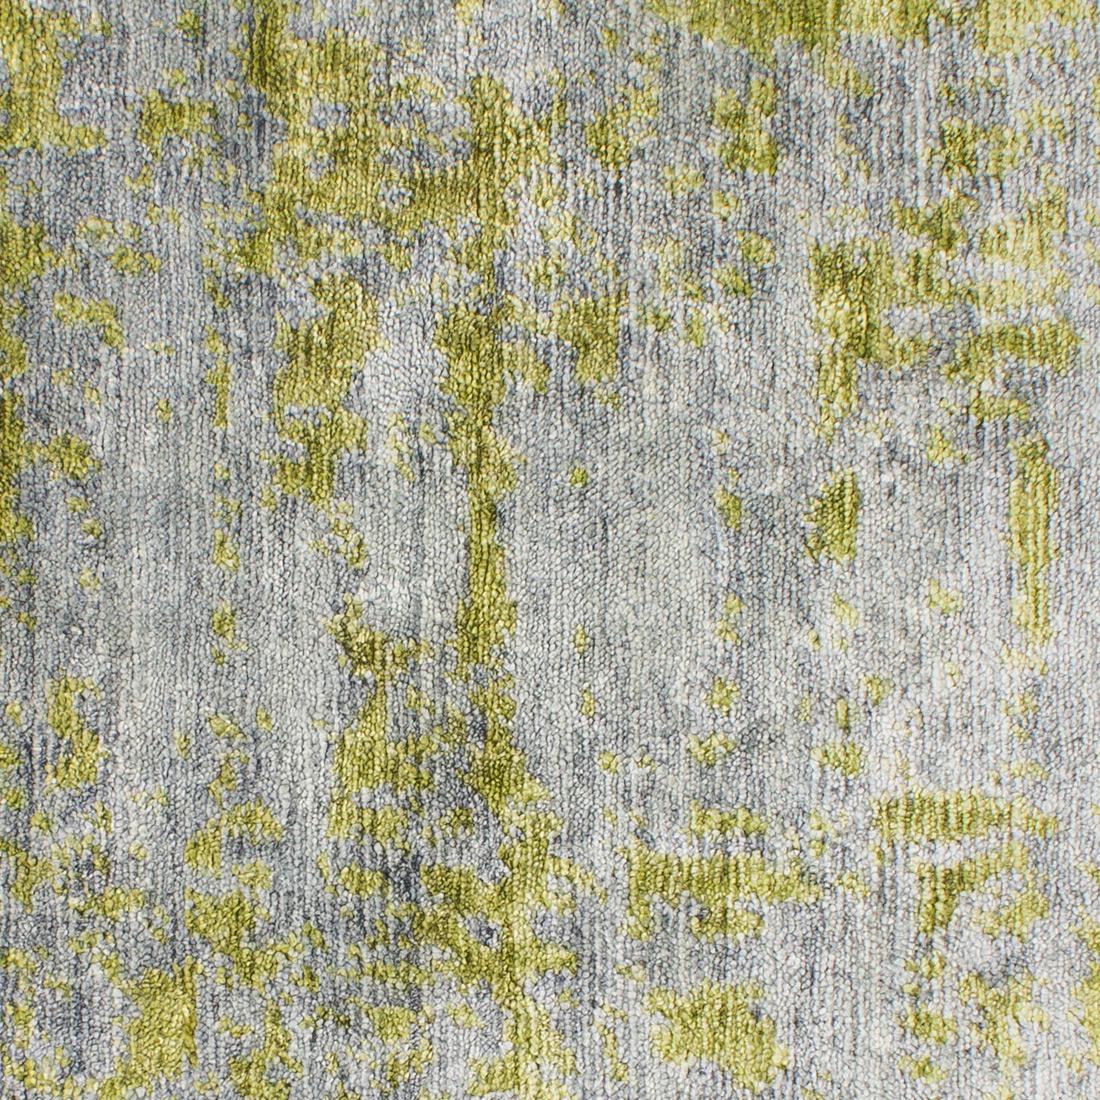 Vloerkleed Xilento Bamboo Grey Green | 170 x 230 cm